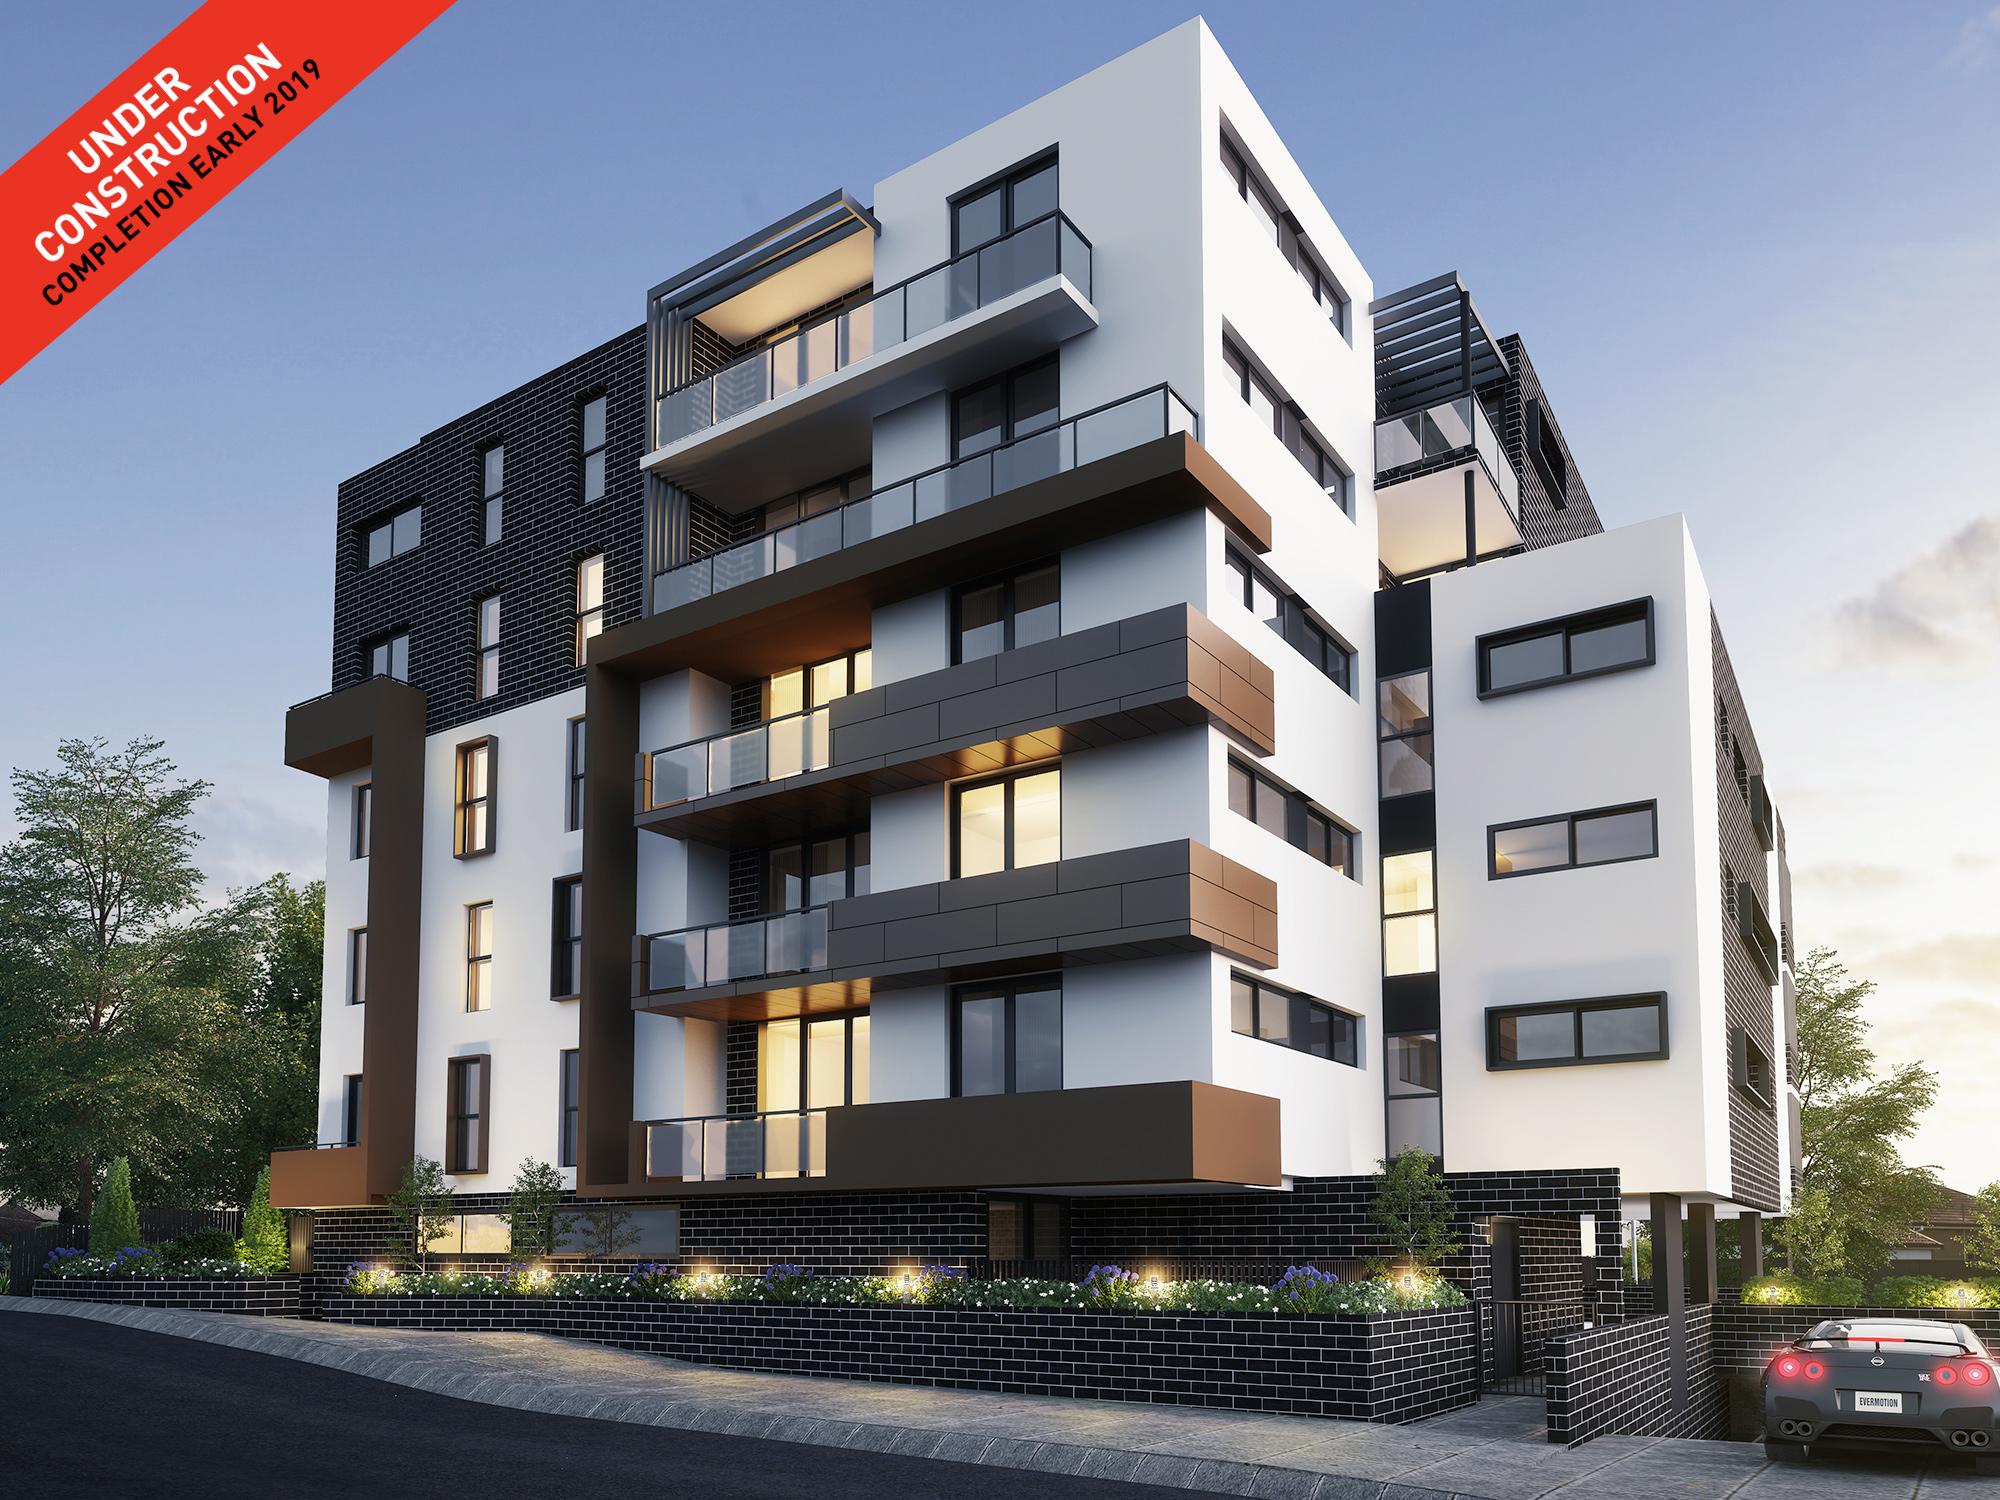 204/124-132 Best Rd  Seven Hills NSW 2147